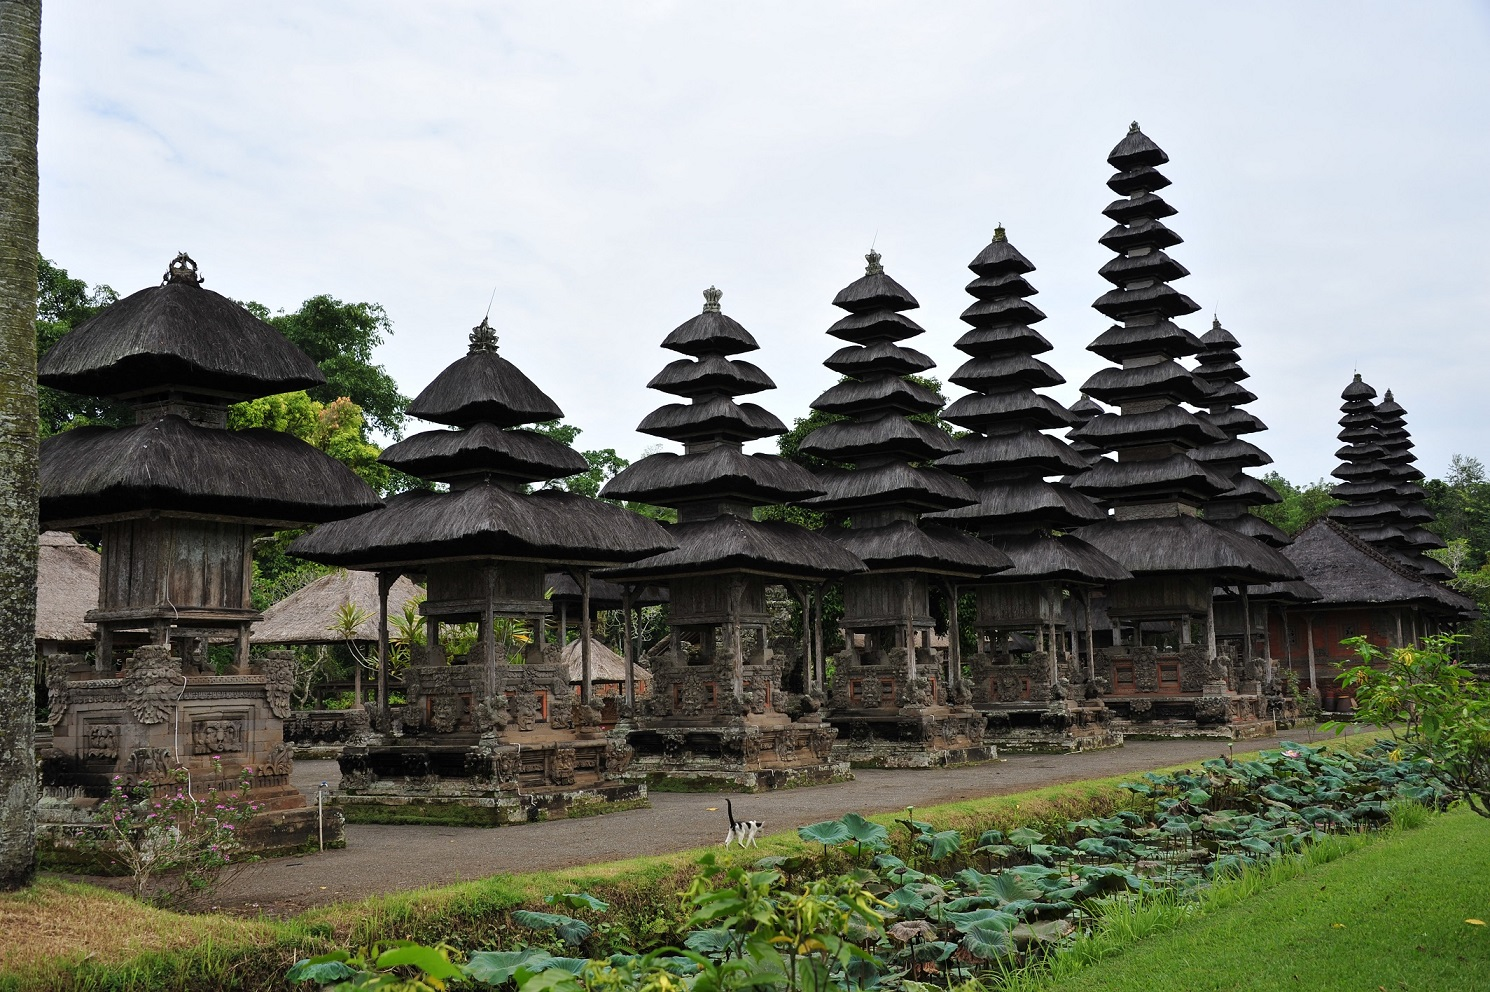 Filming in Bali